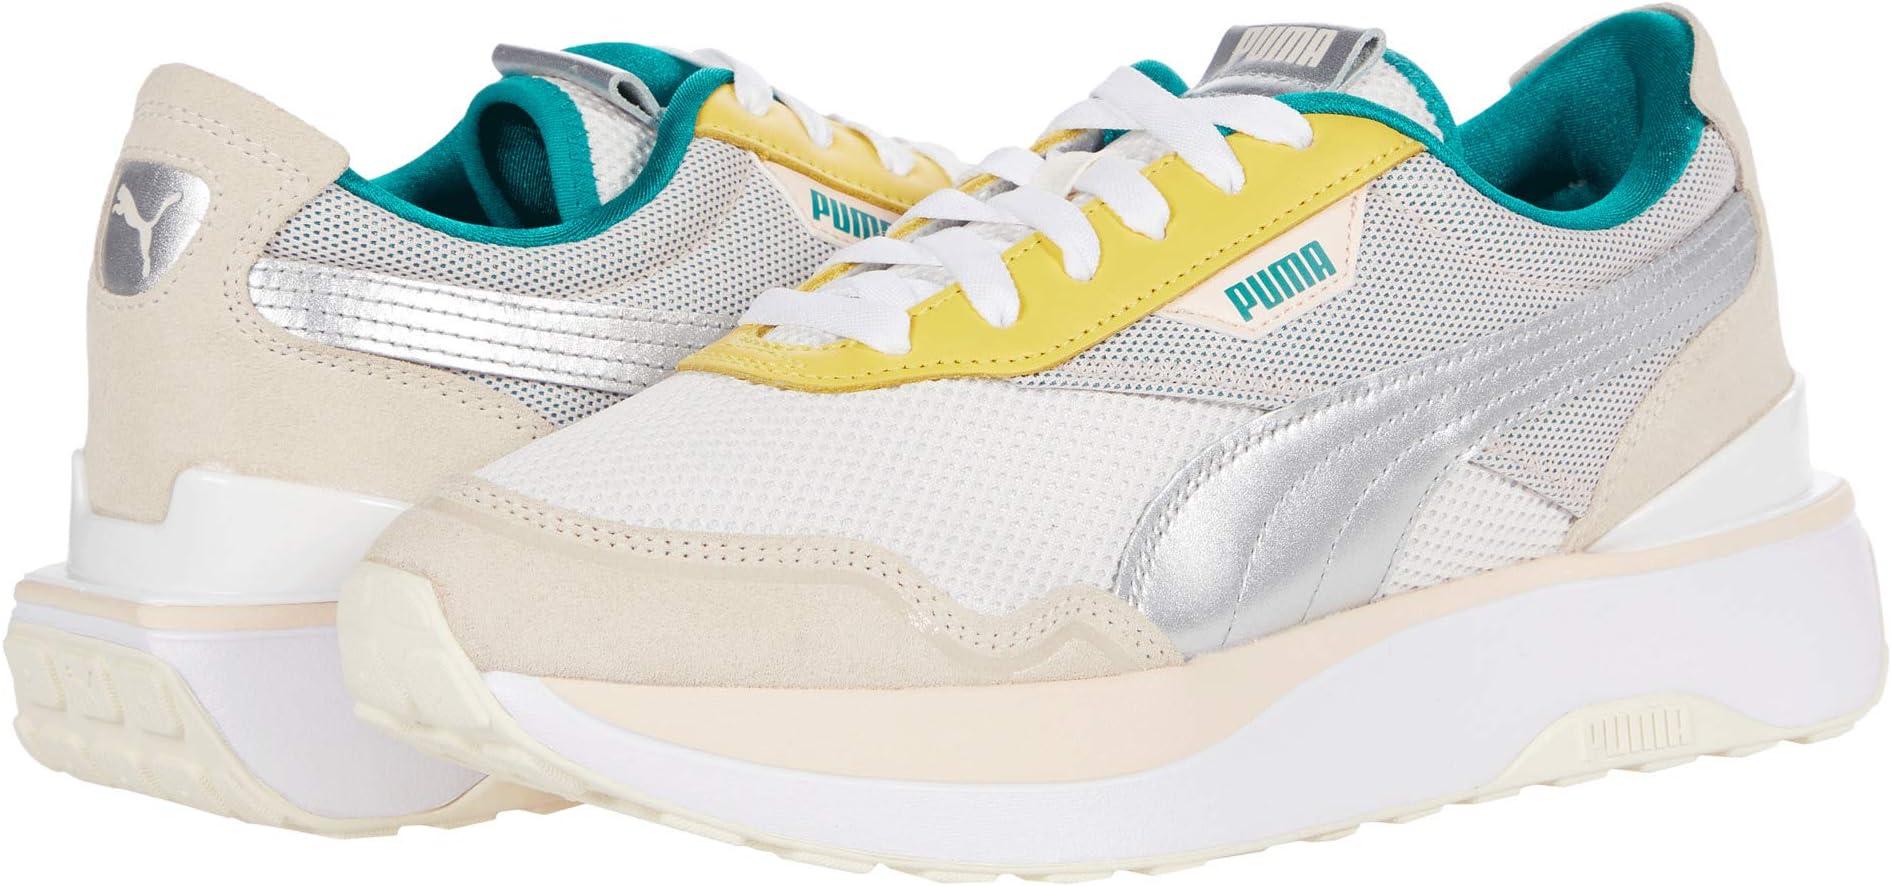 Puma   Shoes, Clothing, Accessories   Zappos   Zappos.com